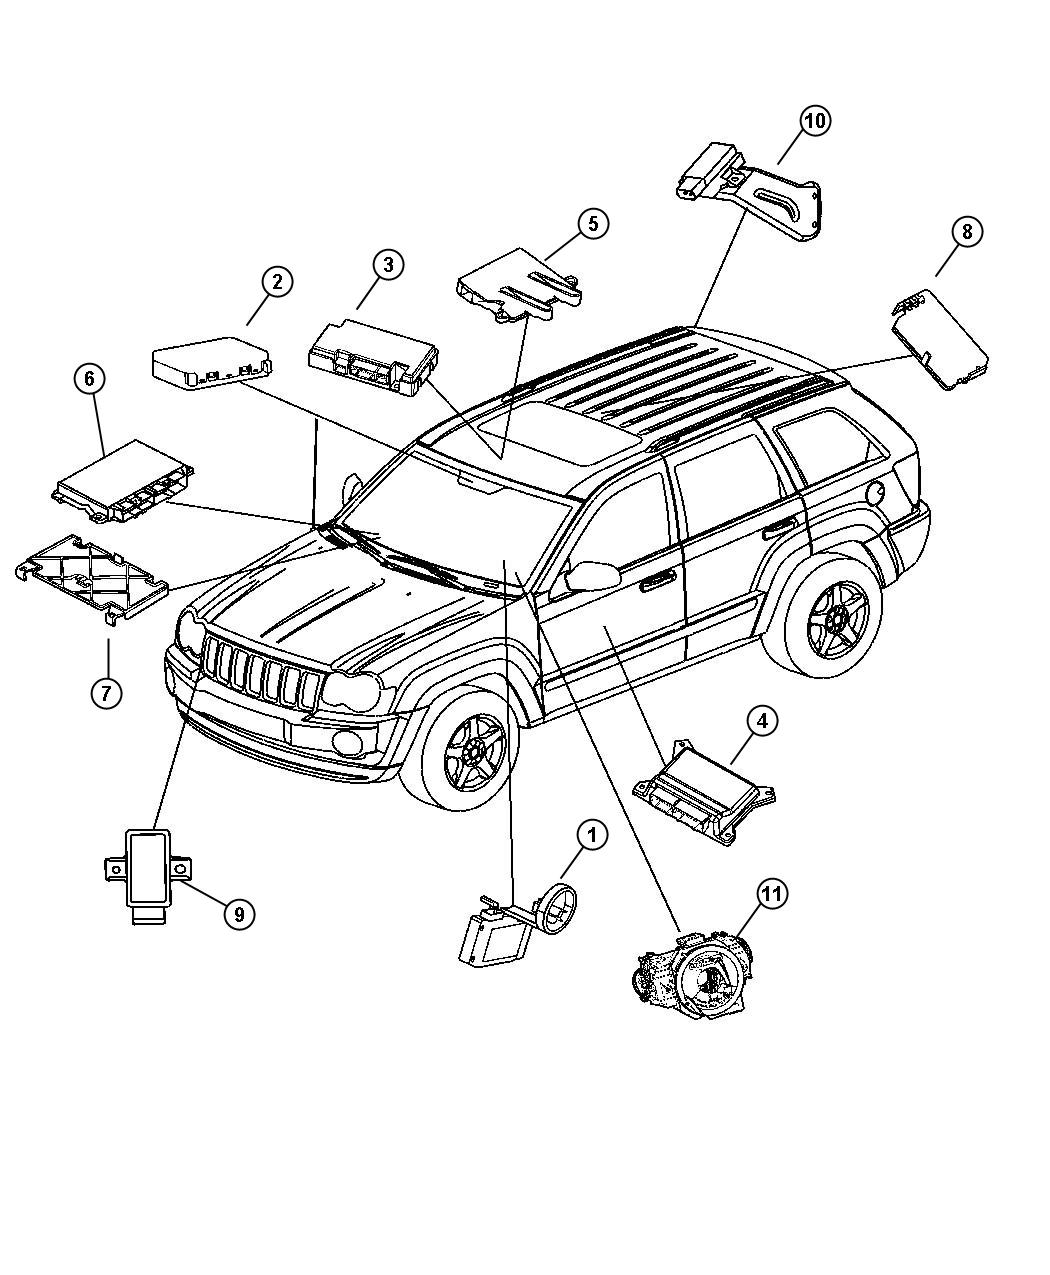 2006 jeep commander receiver control module lab. Black Bedroom Furniture Sets. Home Design Ideas